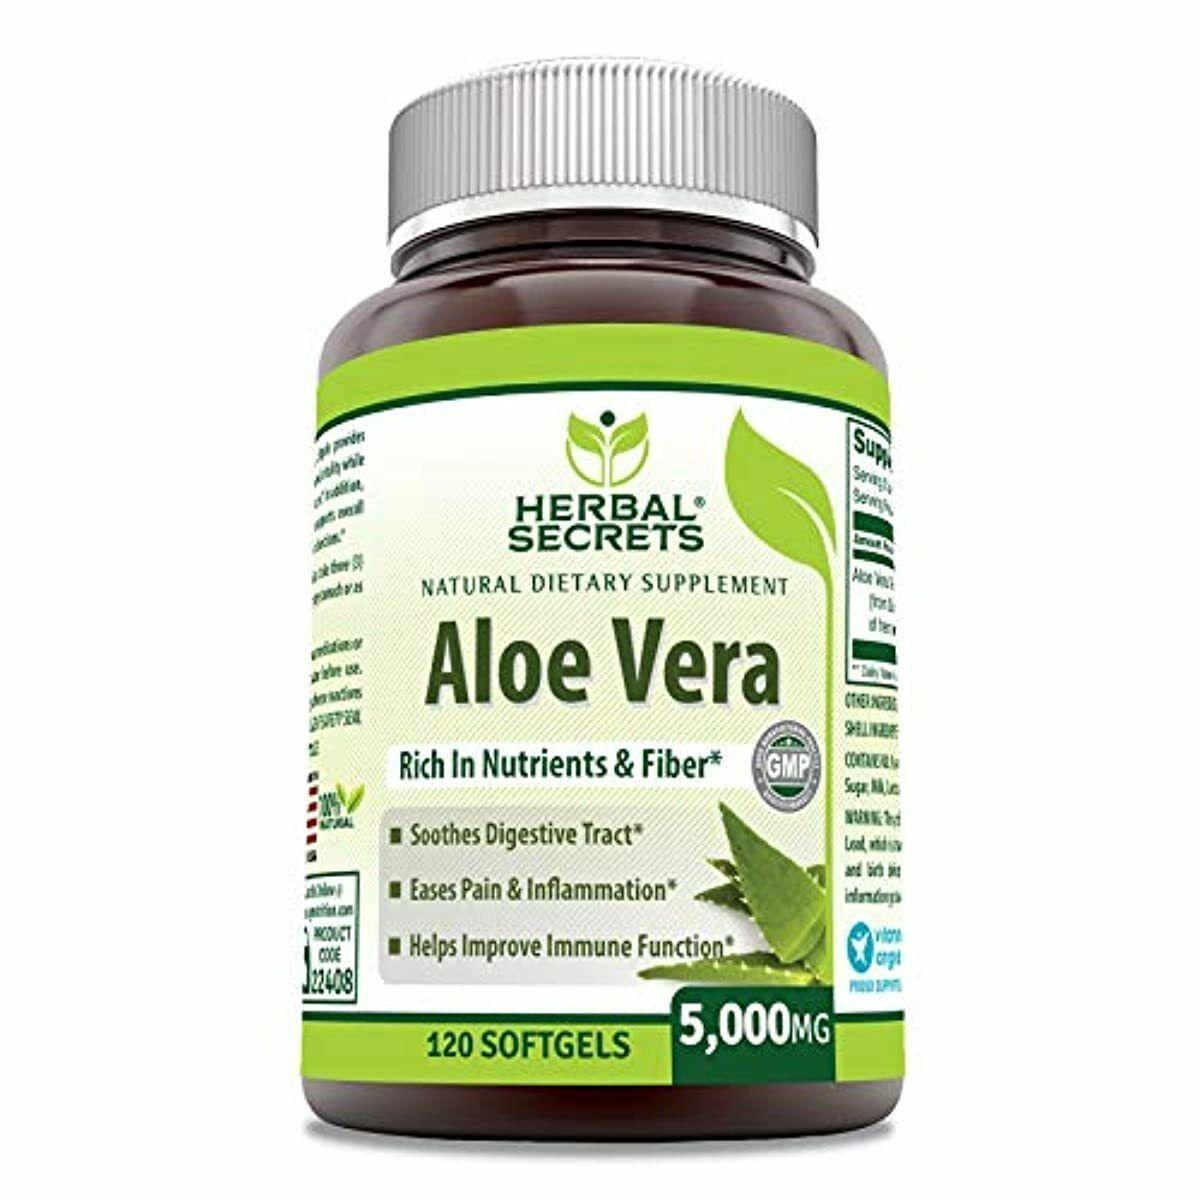 Herbal Secrets Aloe Vera Natural Dietary Supplements, 120 So